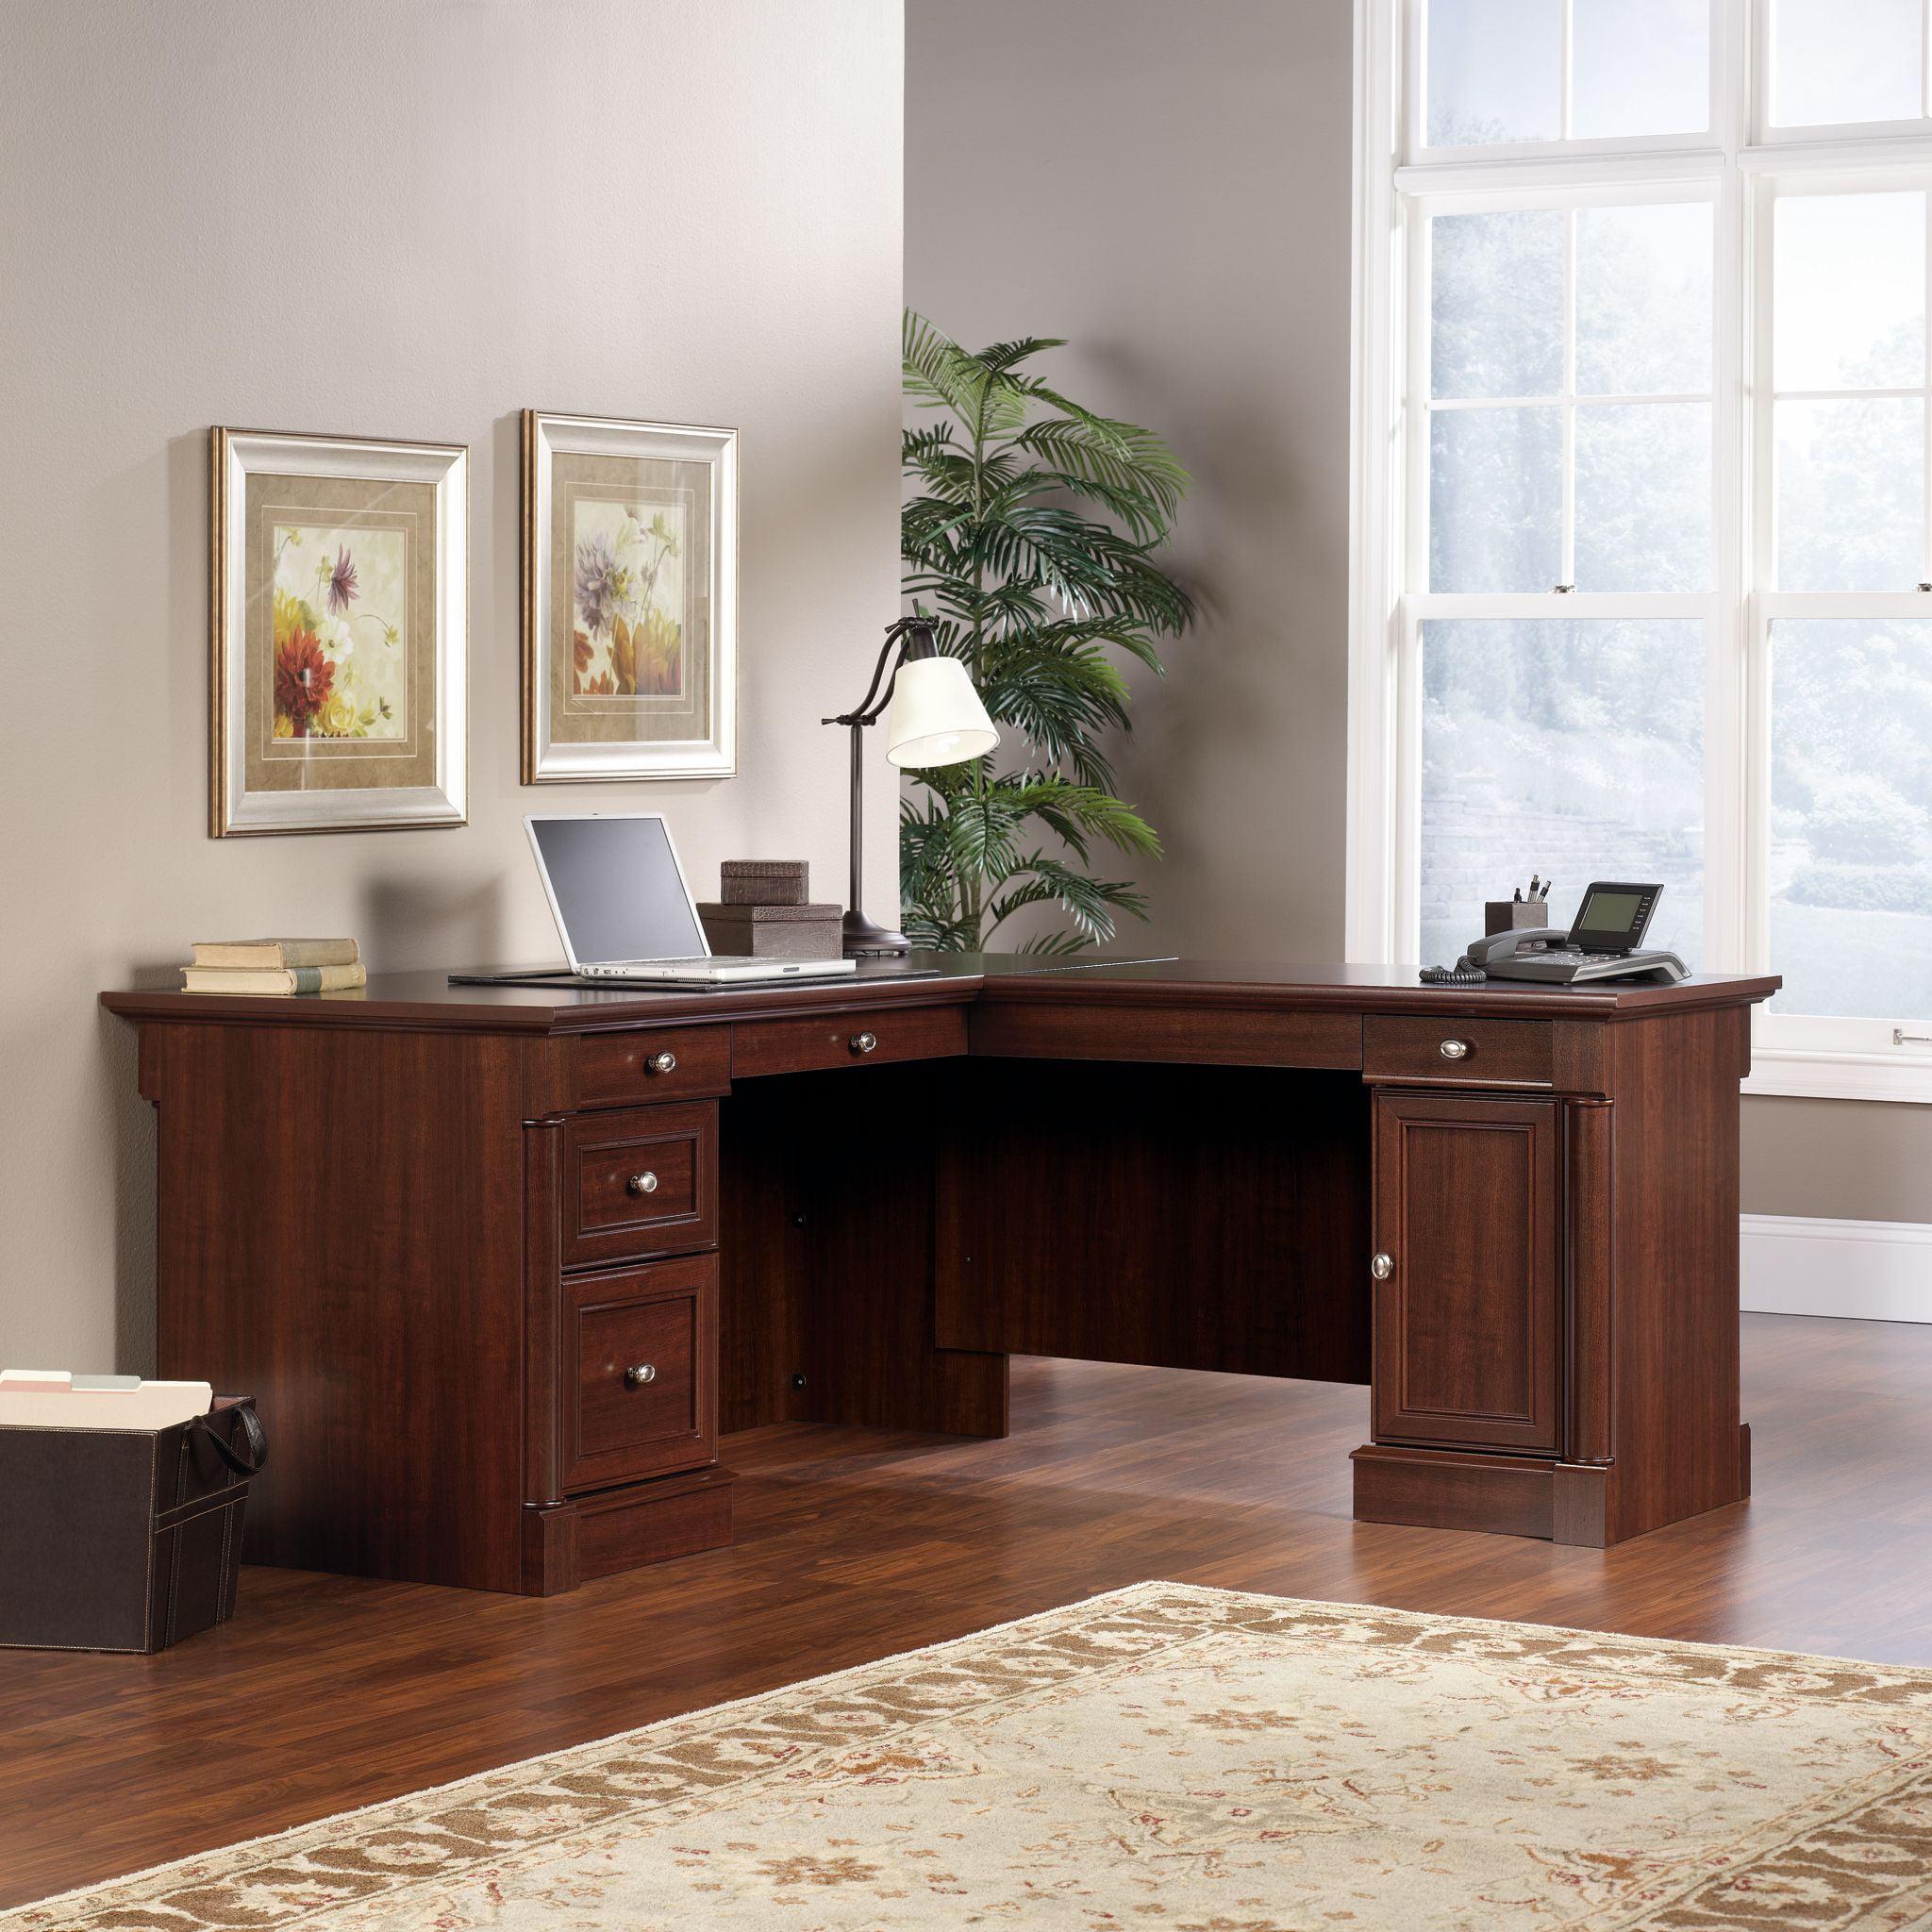 Beau Sauder Palladia L Shaped Desk, Select Cherry Finish   Walmart.com